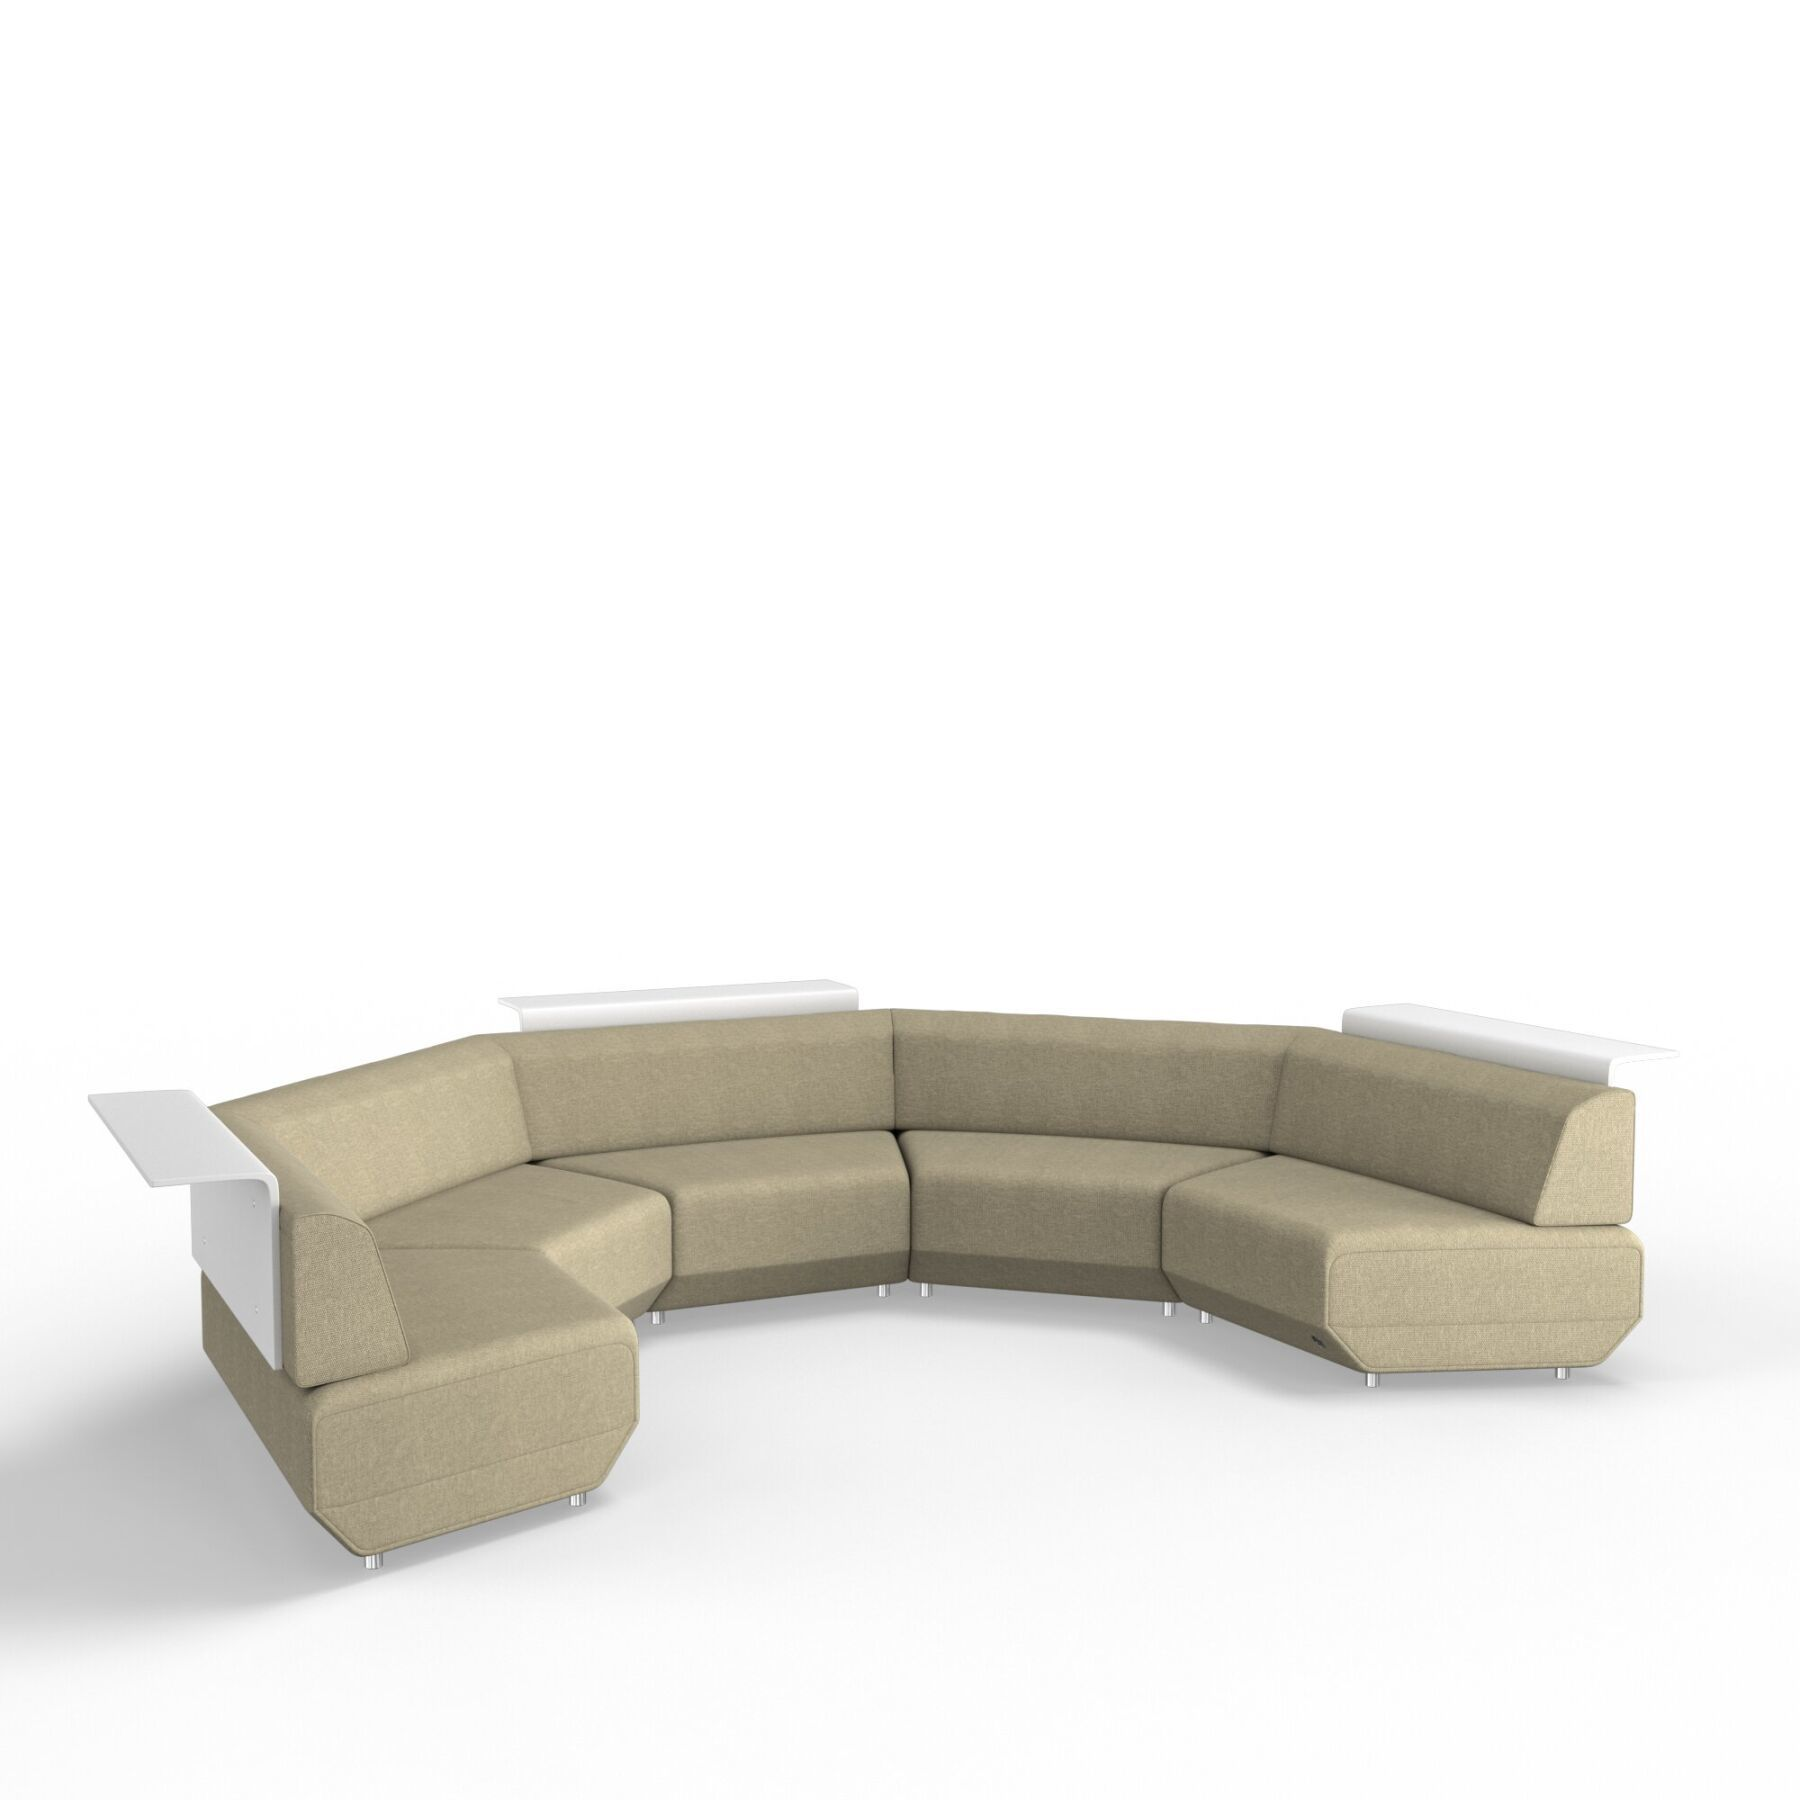 Мягкое кресло KULIK SYSTEM SLICE Ткань Конструктор